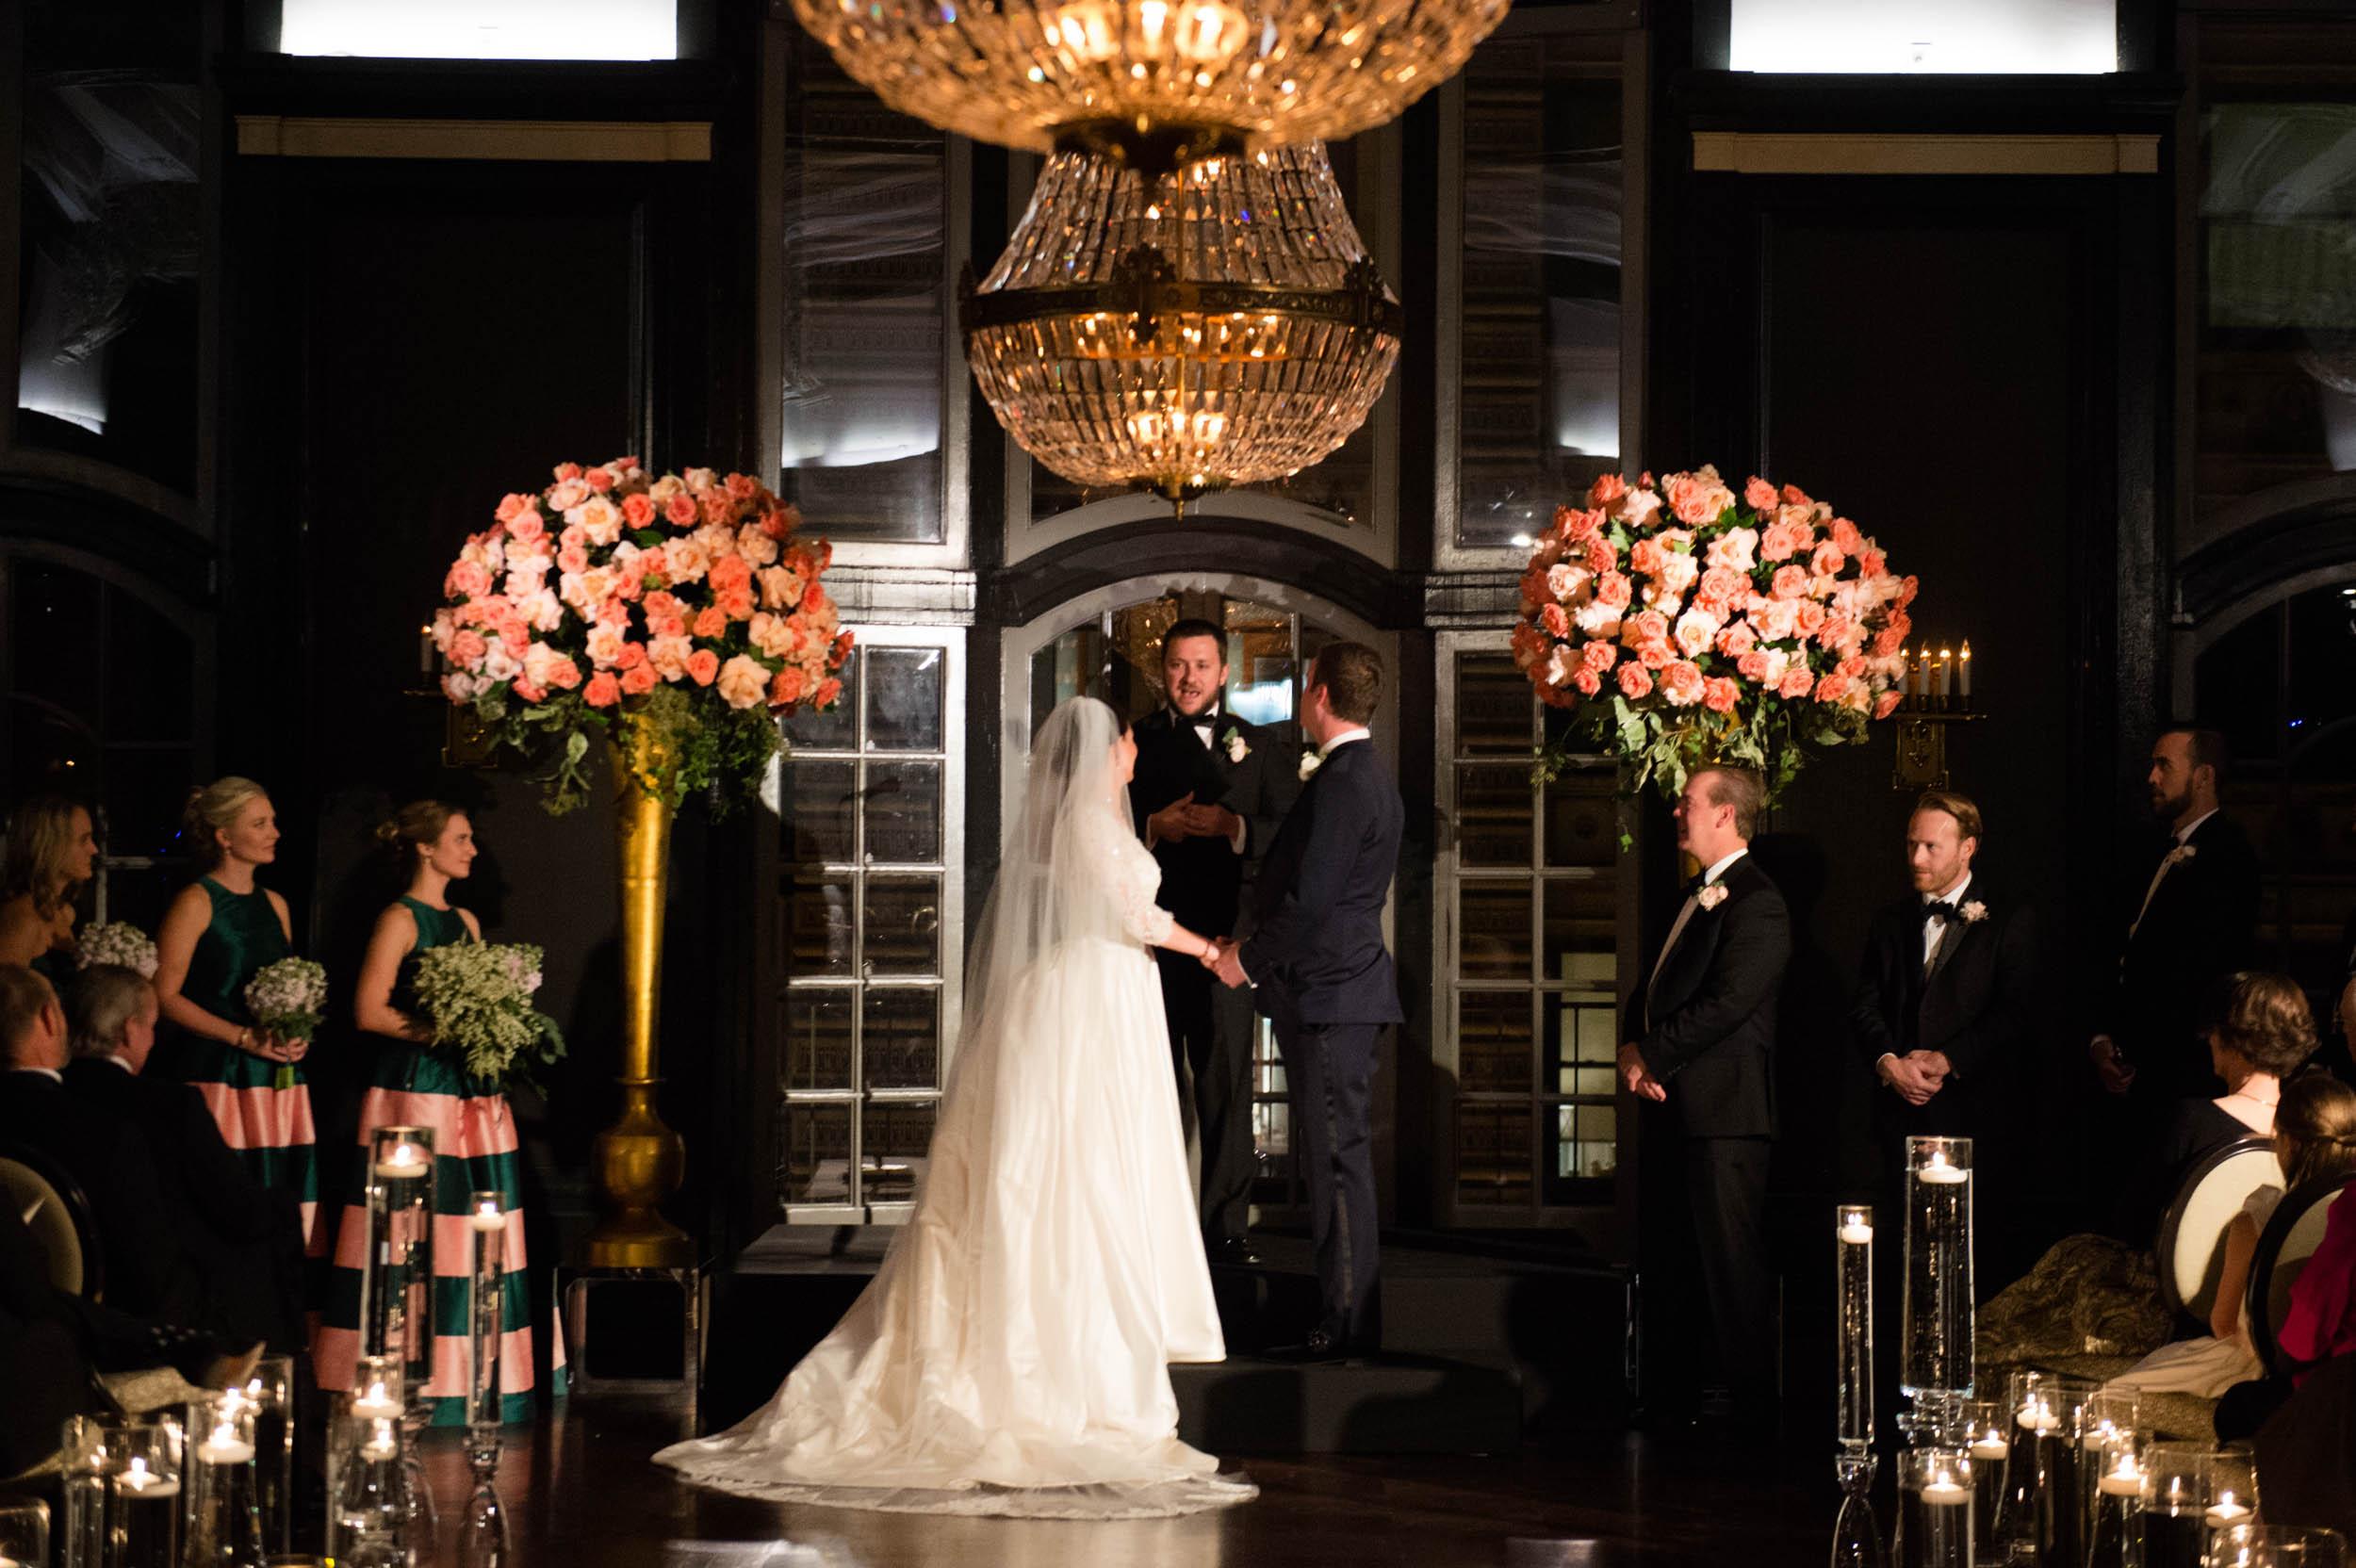 Wedding ceremony at Chicago Athletic Association